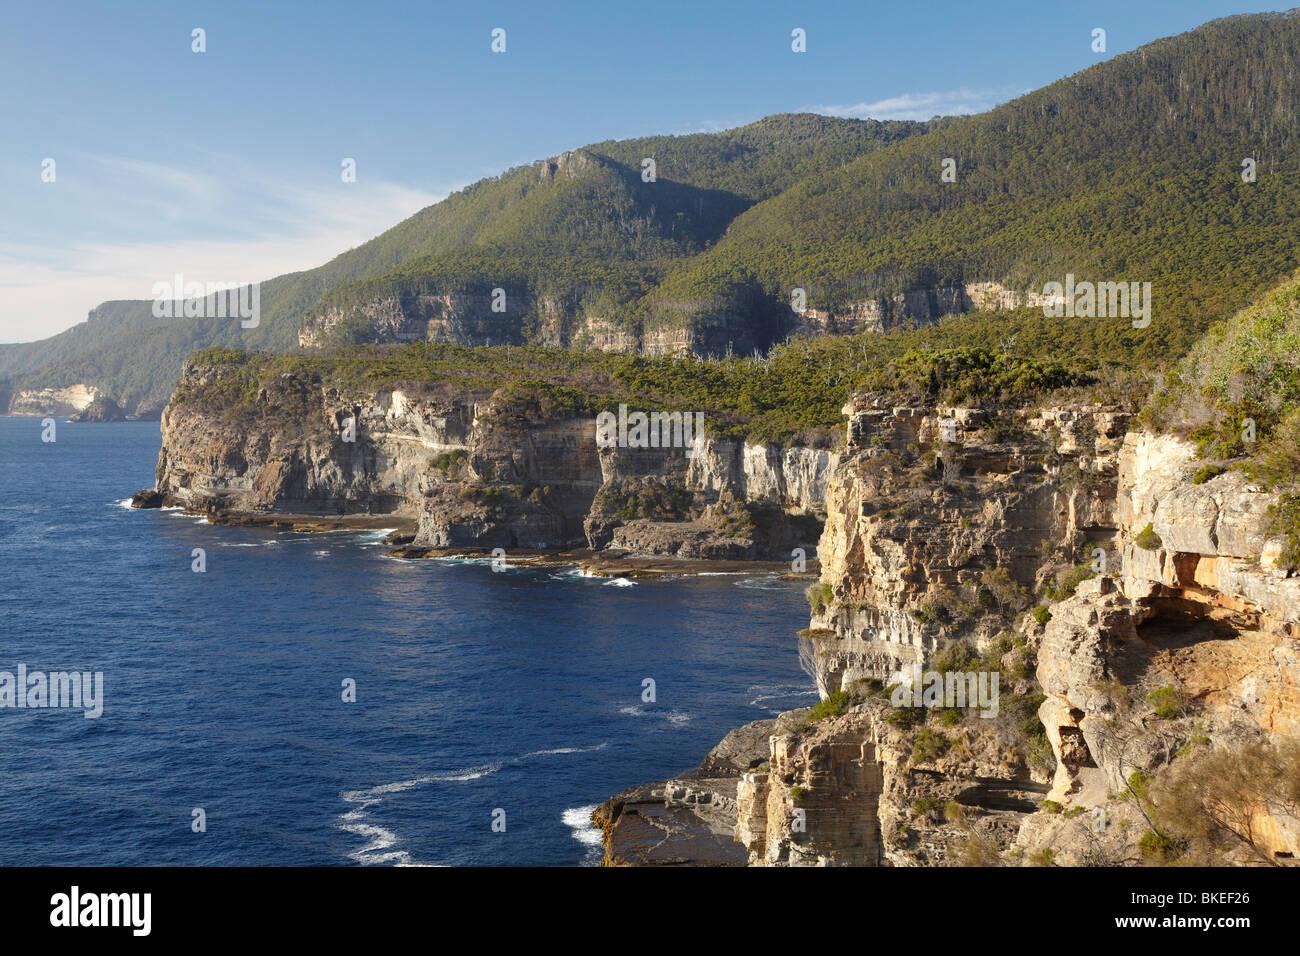 O'Hara Bluff and Tasman Sea, Tasman National Park, Tasman Peninsula, Southern Tasmania, Australia - Stock Image